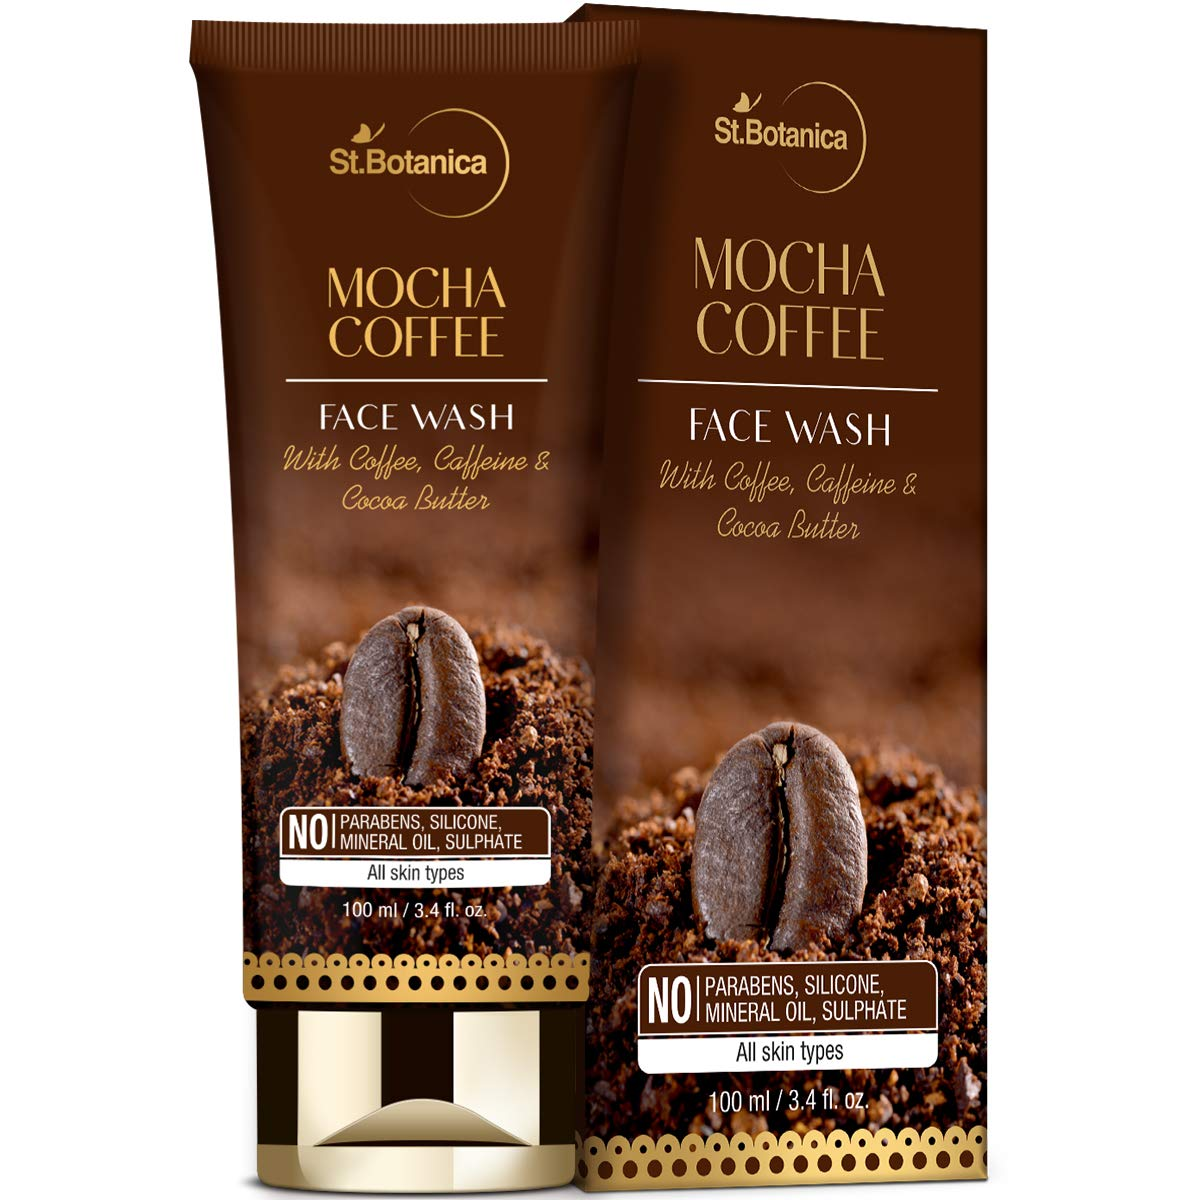 StBotanica Mocha Coffee Face 100ml With Wash Ranking TOP2 Cheap bargain Caffeine